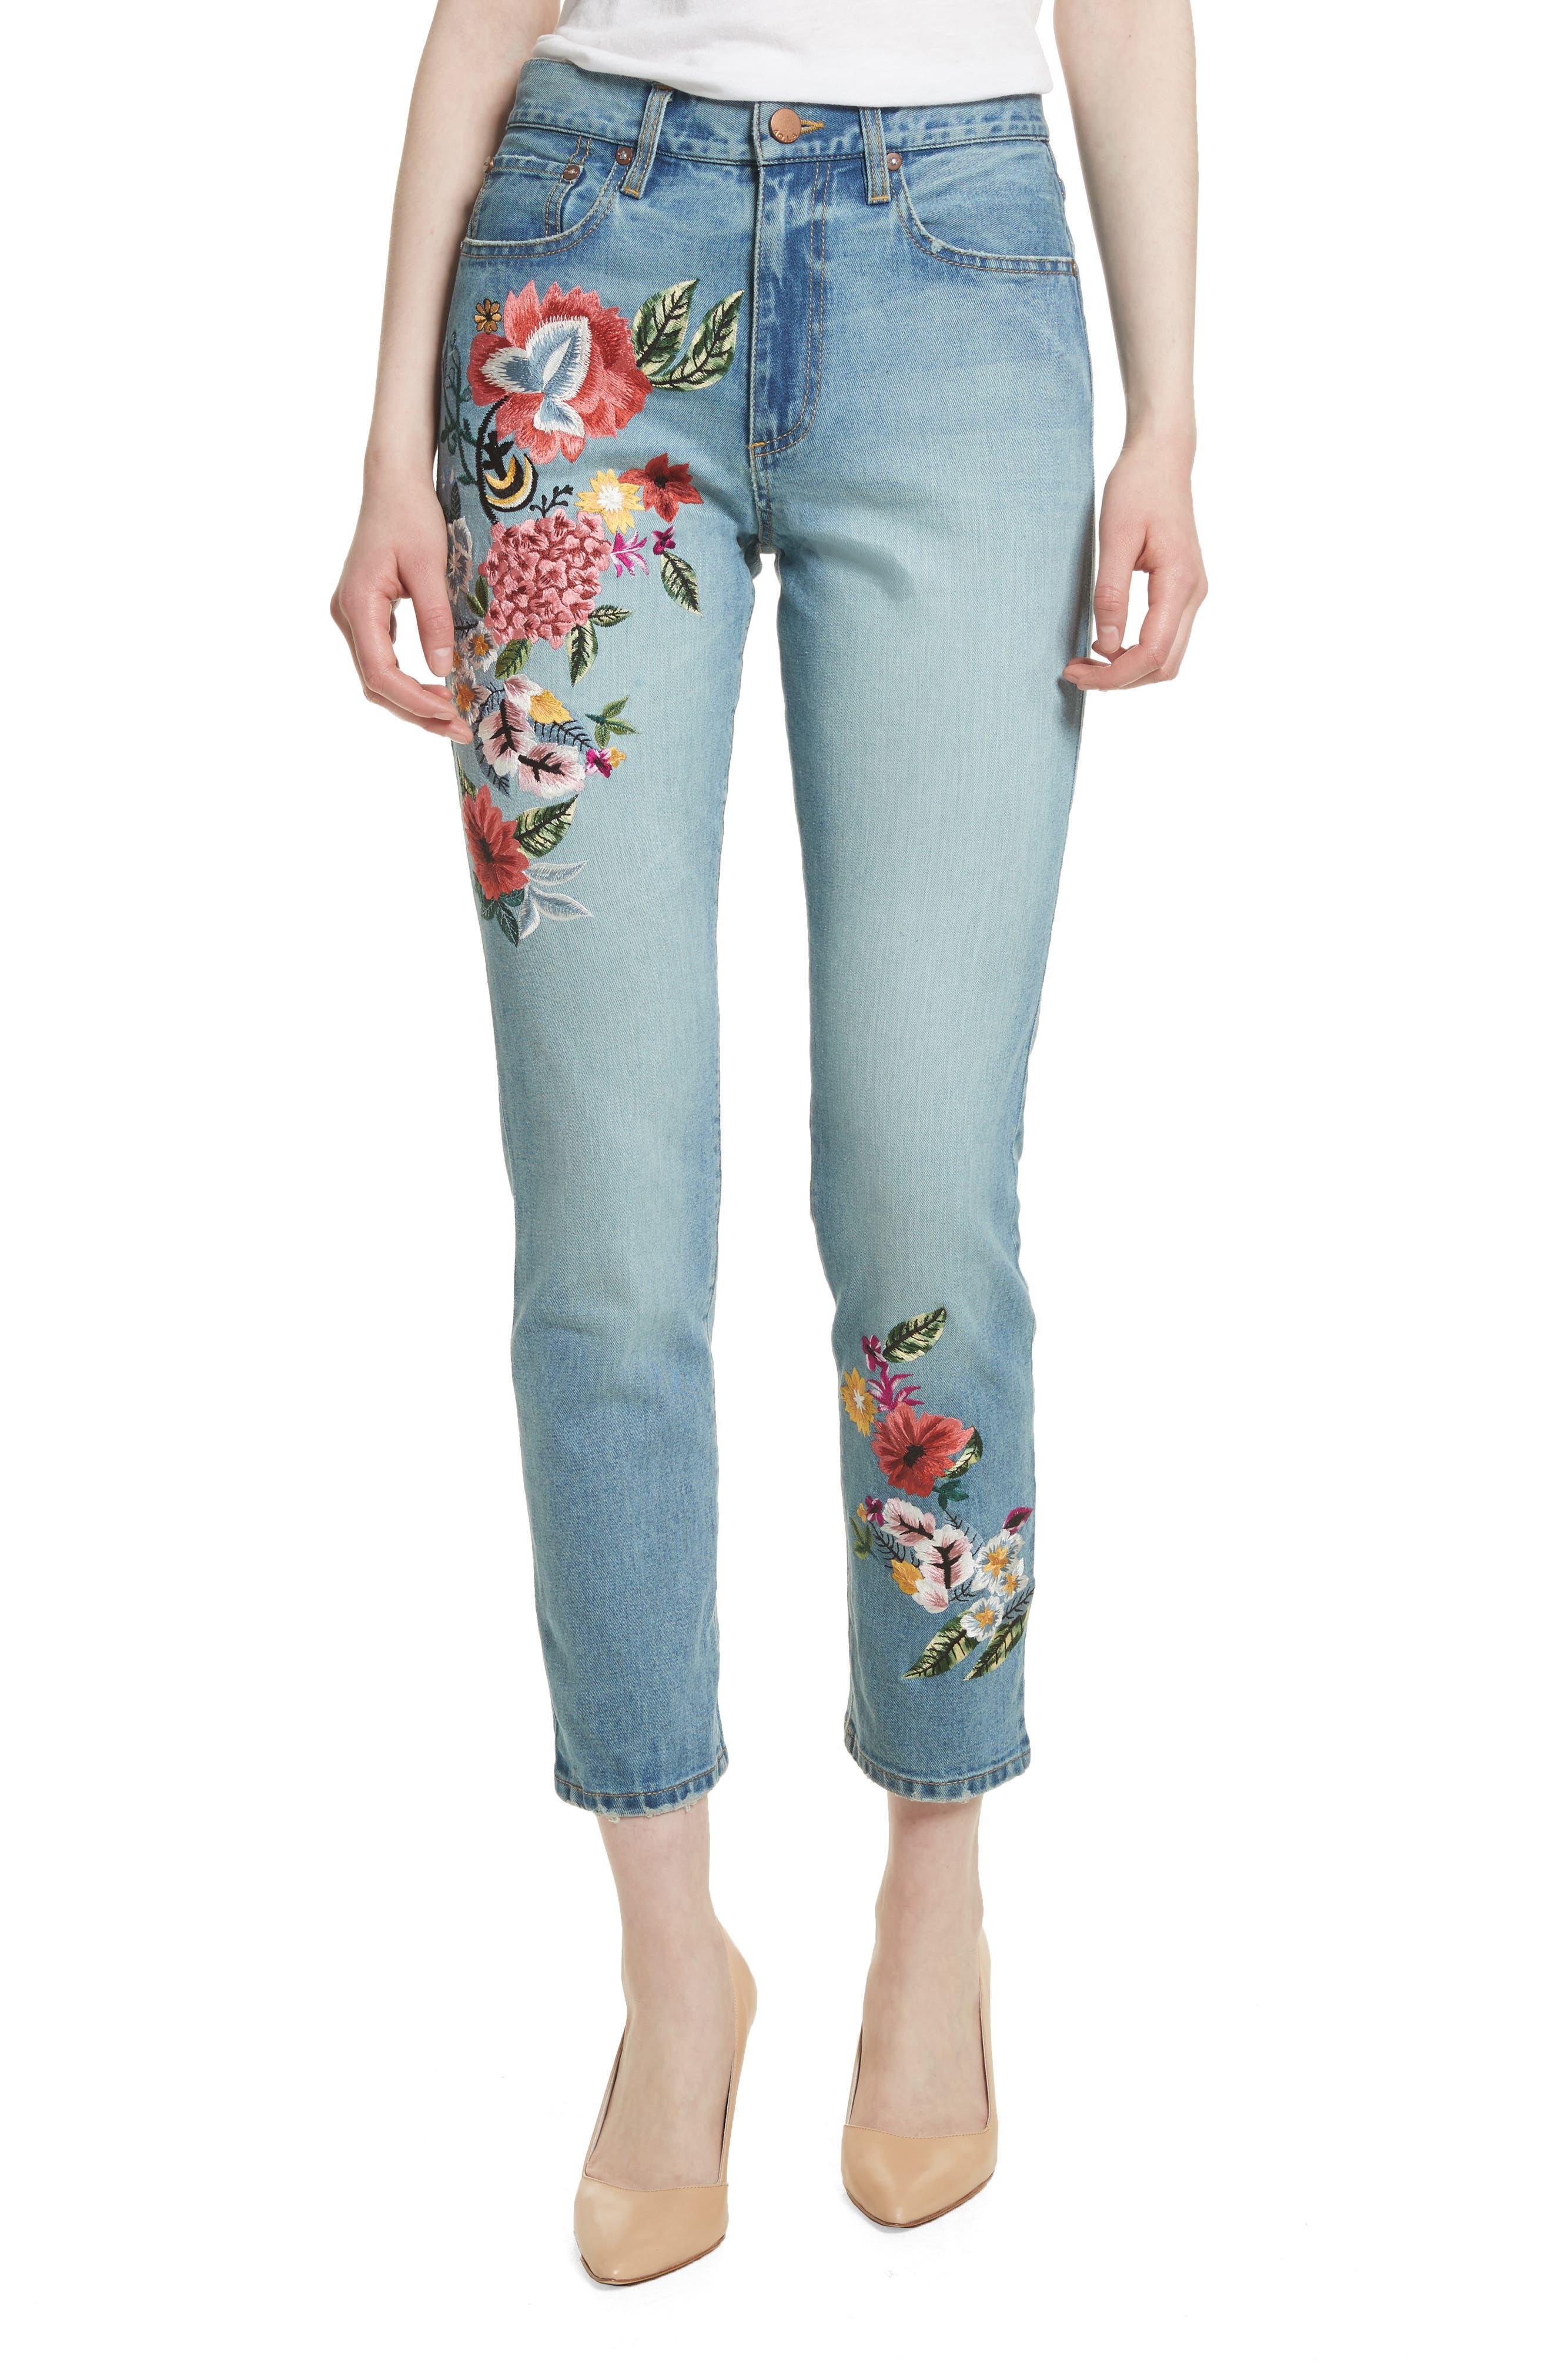 AO.LA Amazing Embroidered Slim Crop Jeans,                             Main thumbnail 1, color,                             Multi